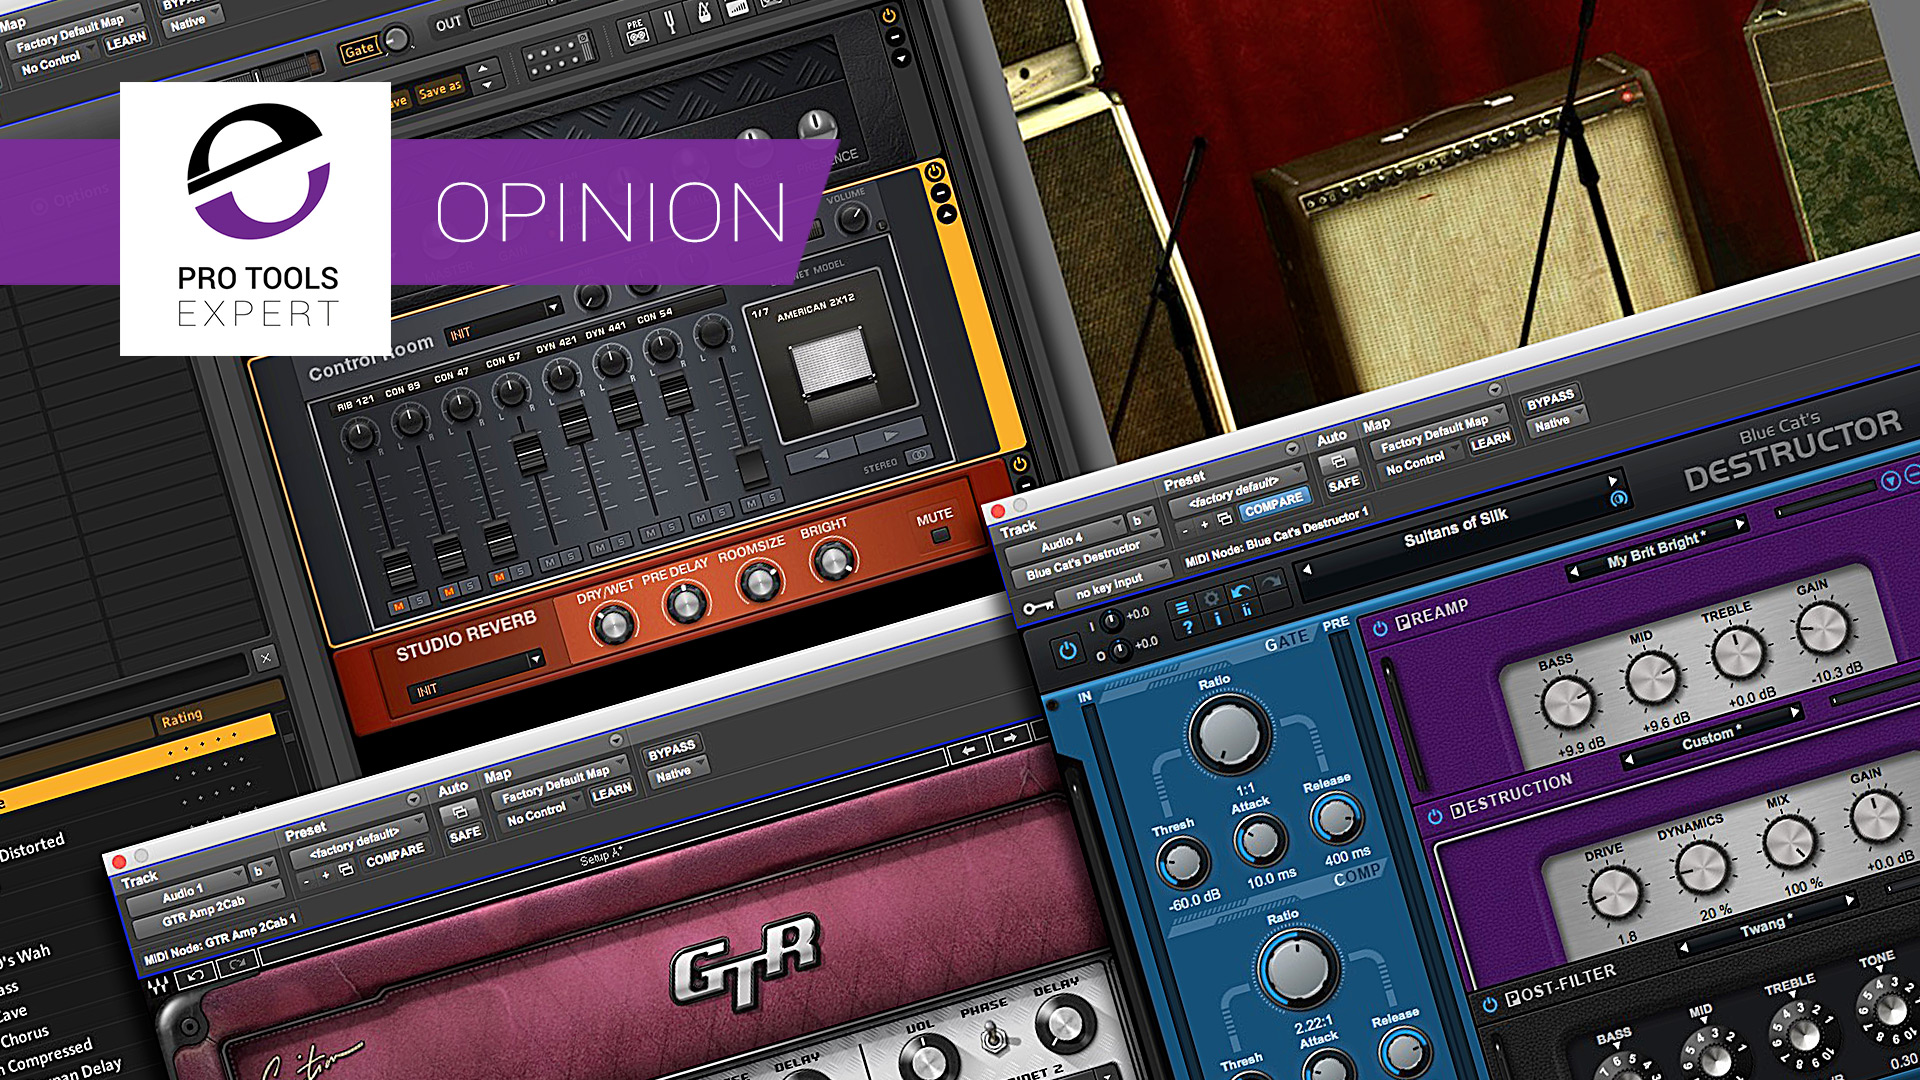 guitar-amp-plug-in-presets-pro-tools-expert-recording-mixing.jpg